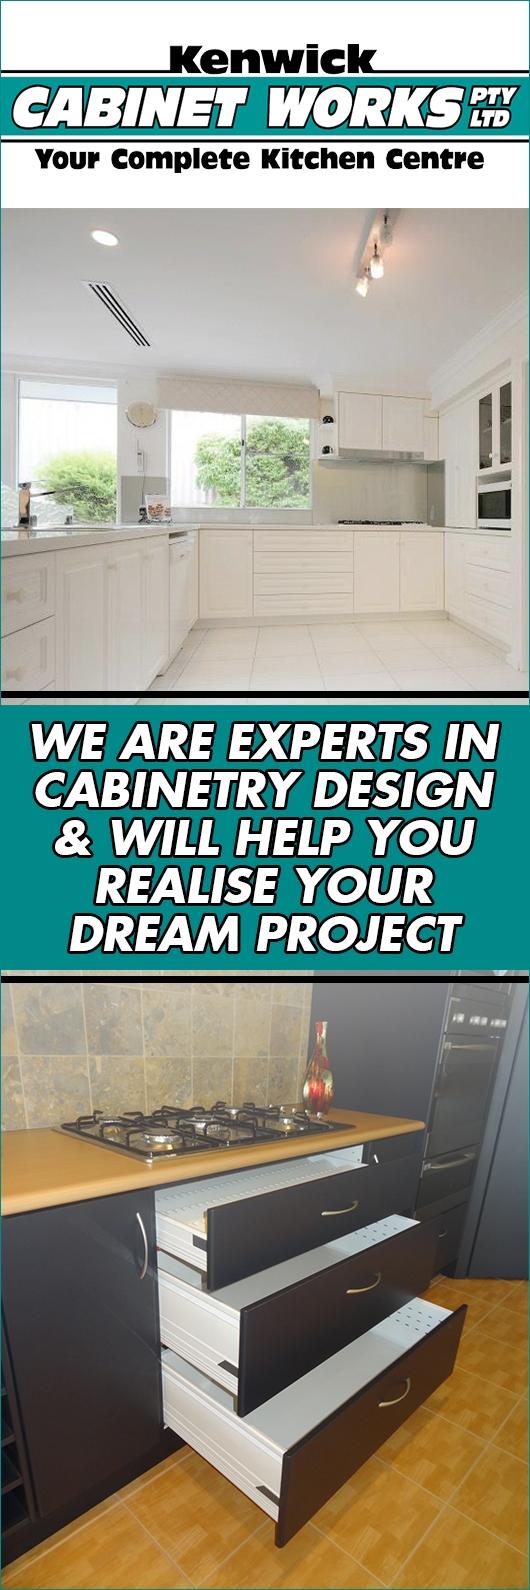 Kenwick Cabinet Works Pty Ltd - Kitchen Renovations & Designs - PERTH